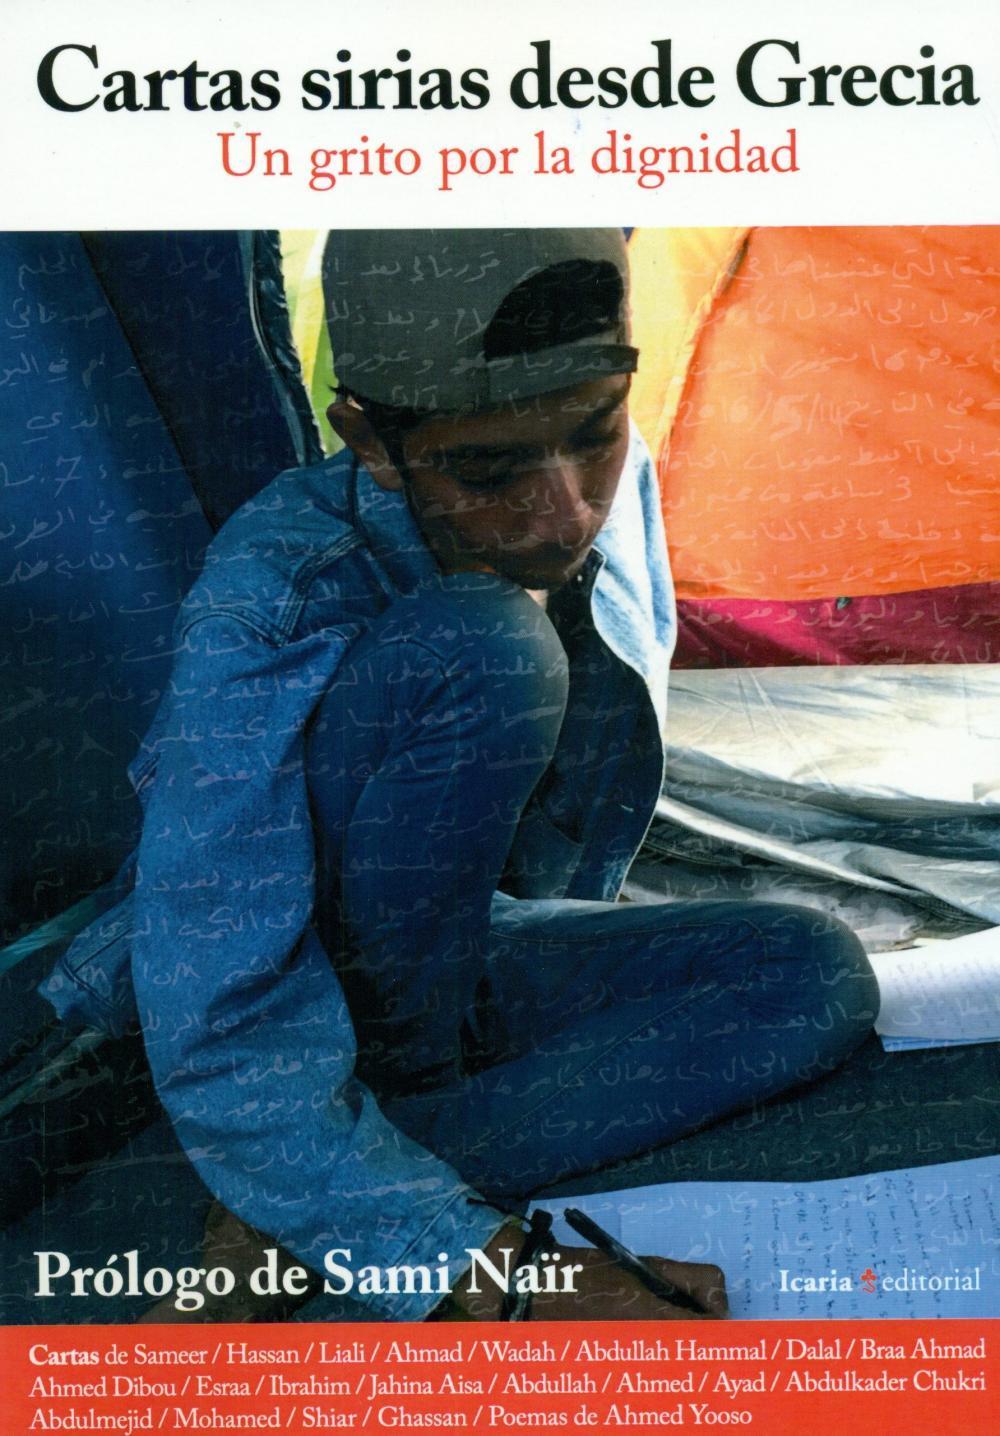 Cartas sirias desde Grecia